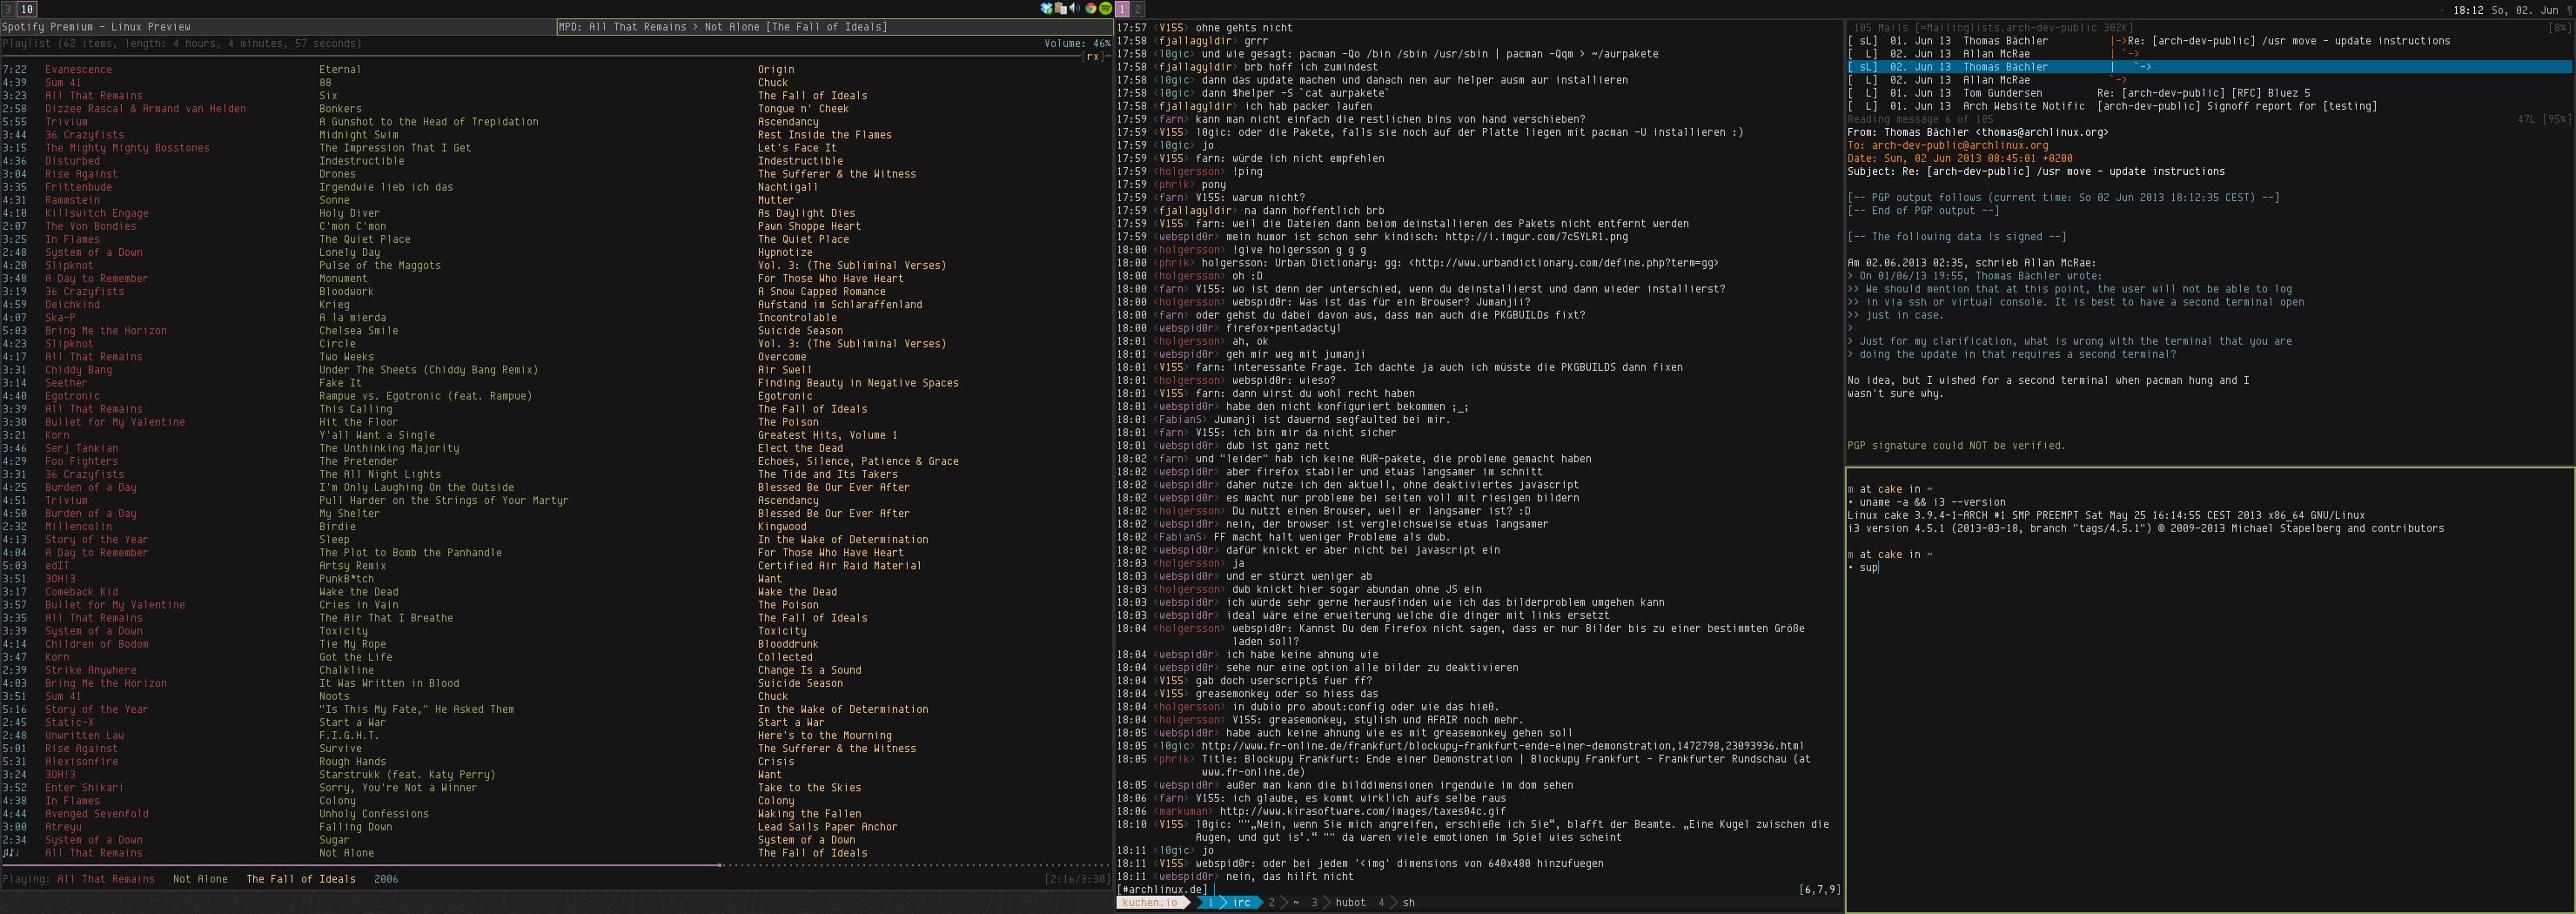 Desktop - June 2013 by bl1nks